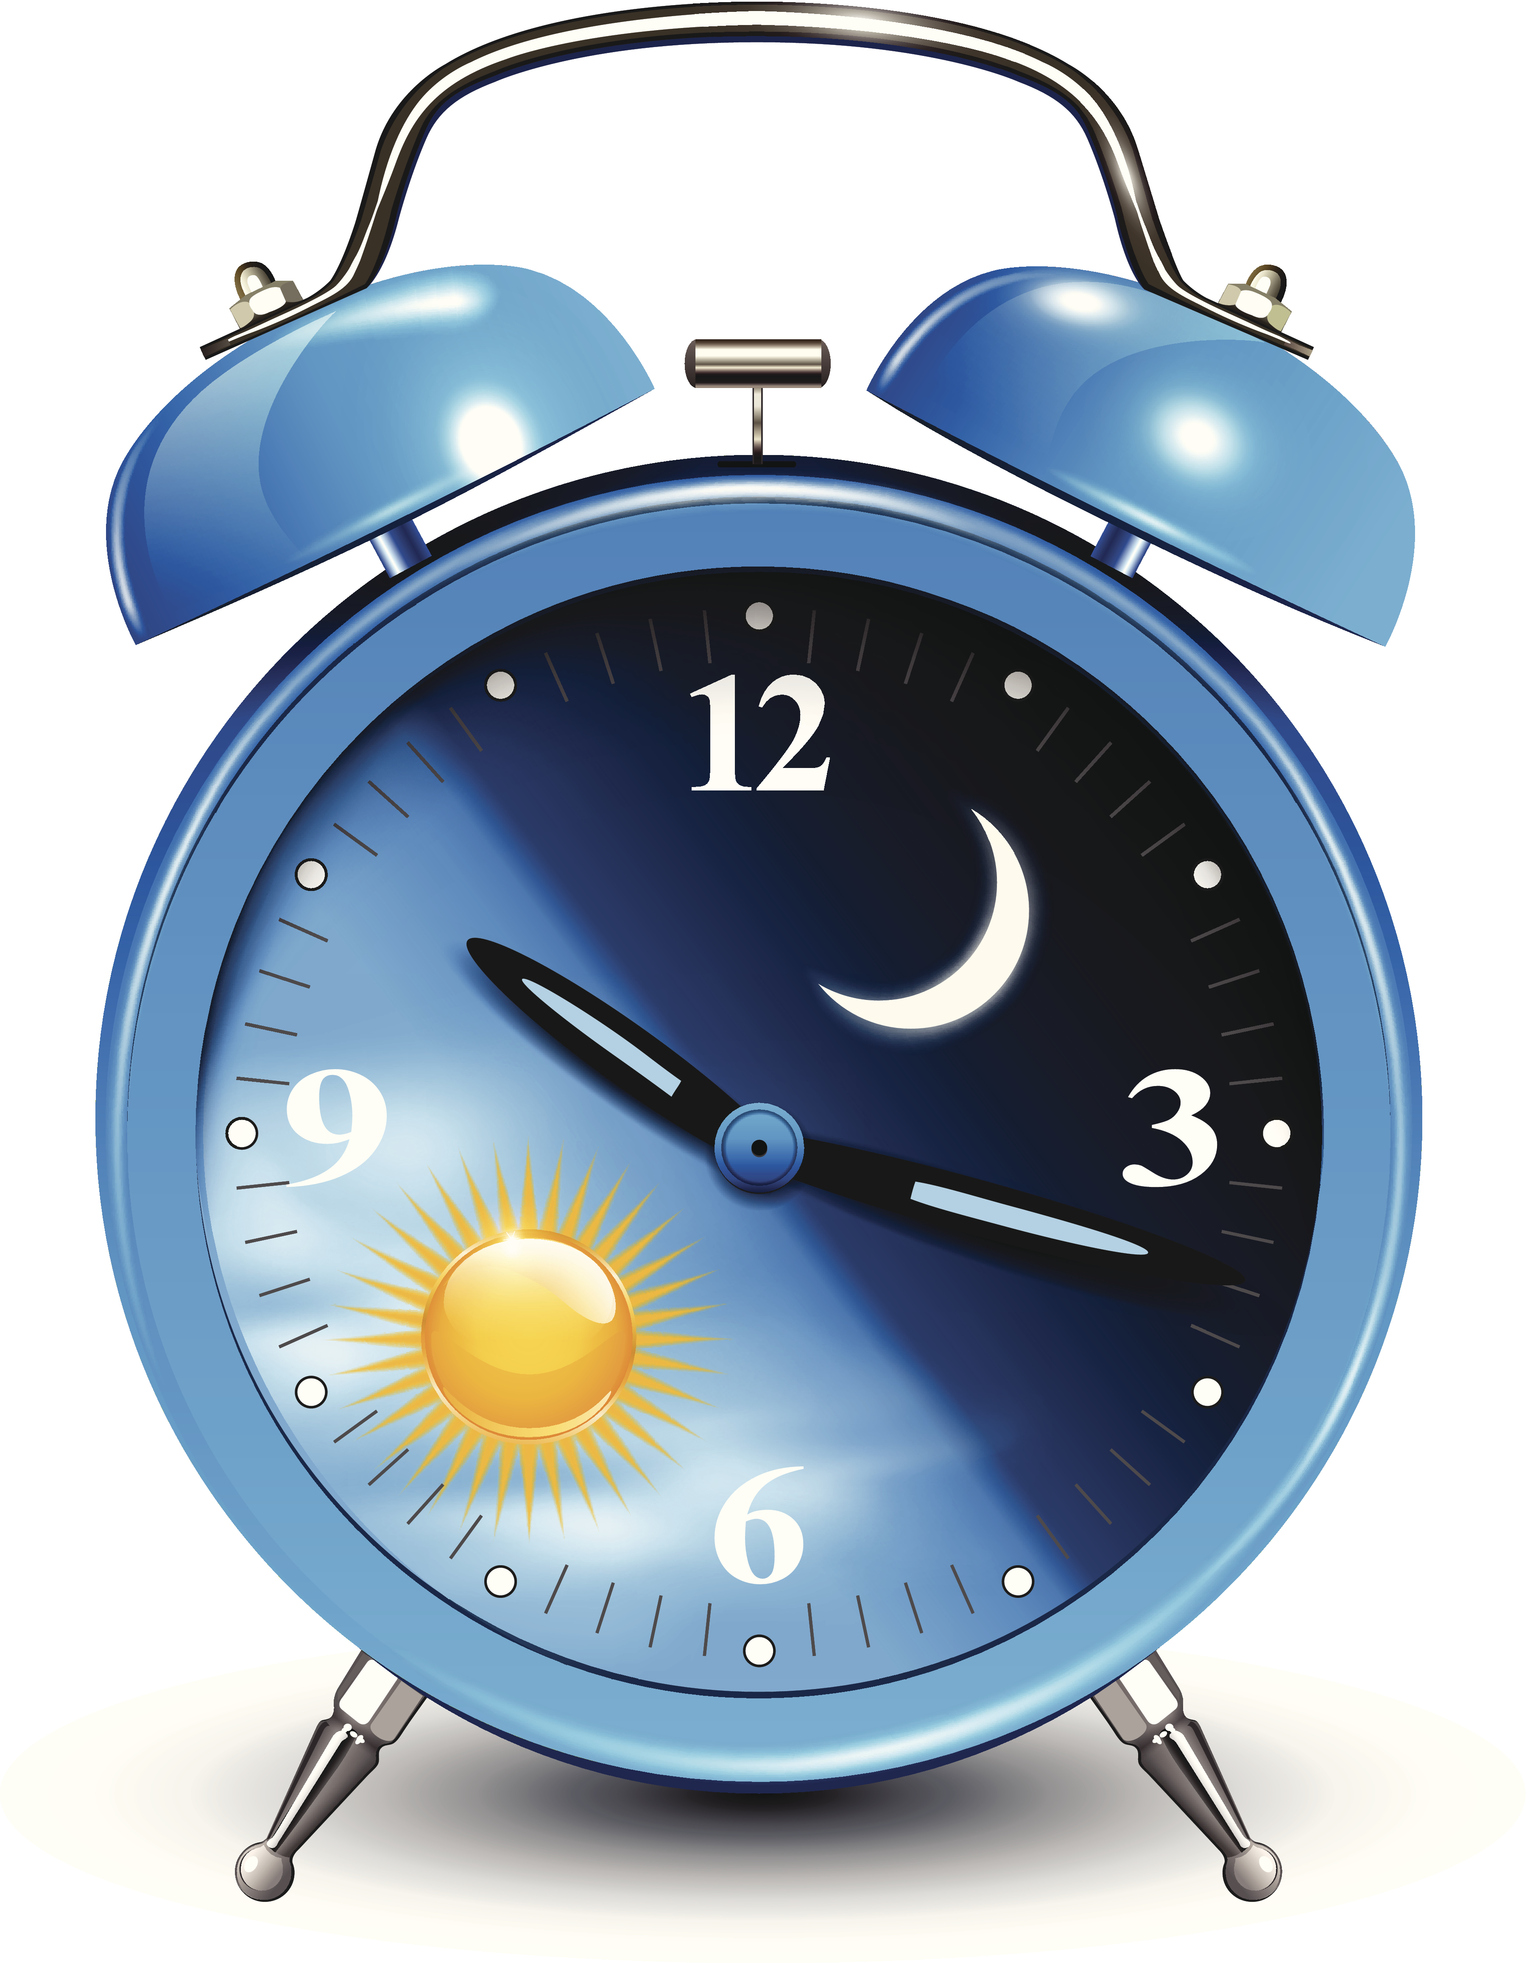 Circadian rhythm, functional medicine, cortisol, melatonin, Dr Laura Paris, sleep, insomnia, energy, adrenals